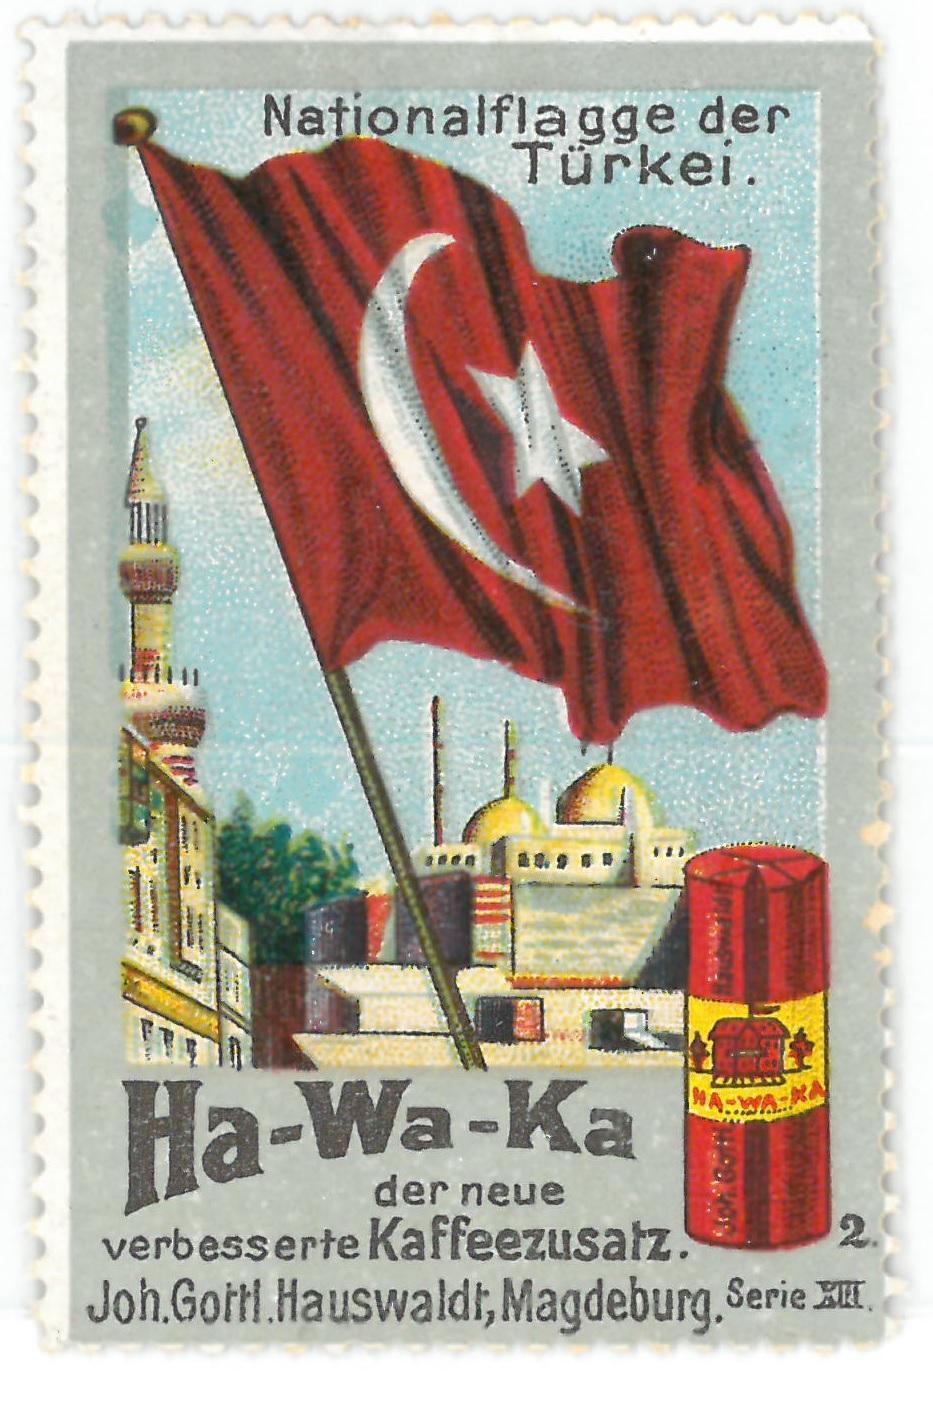 Ha Wa Ka aus Magdeburg